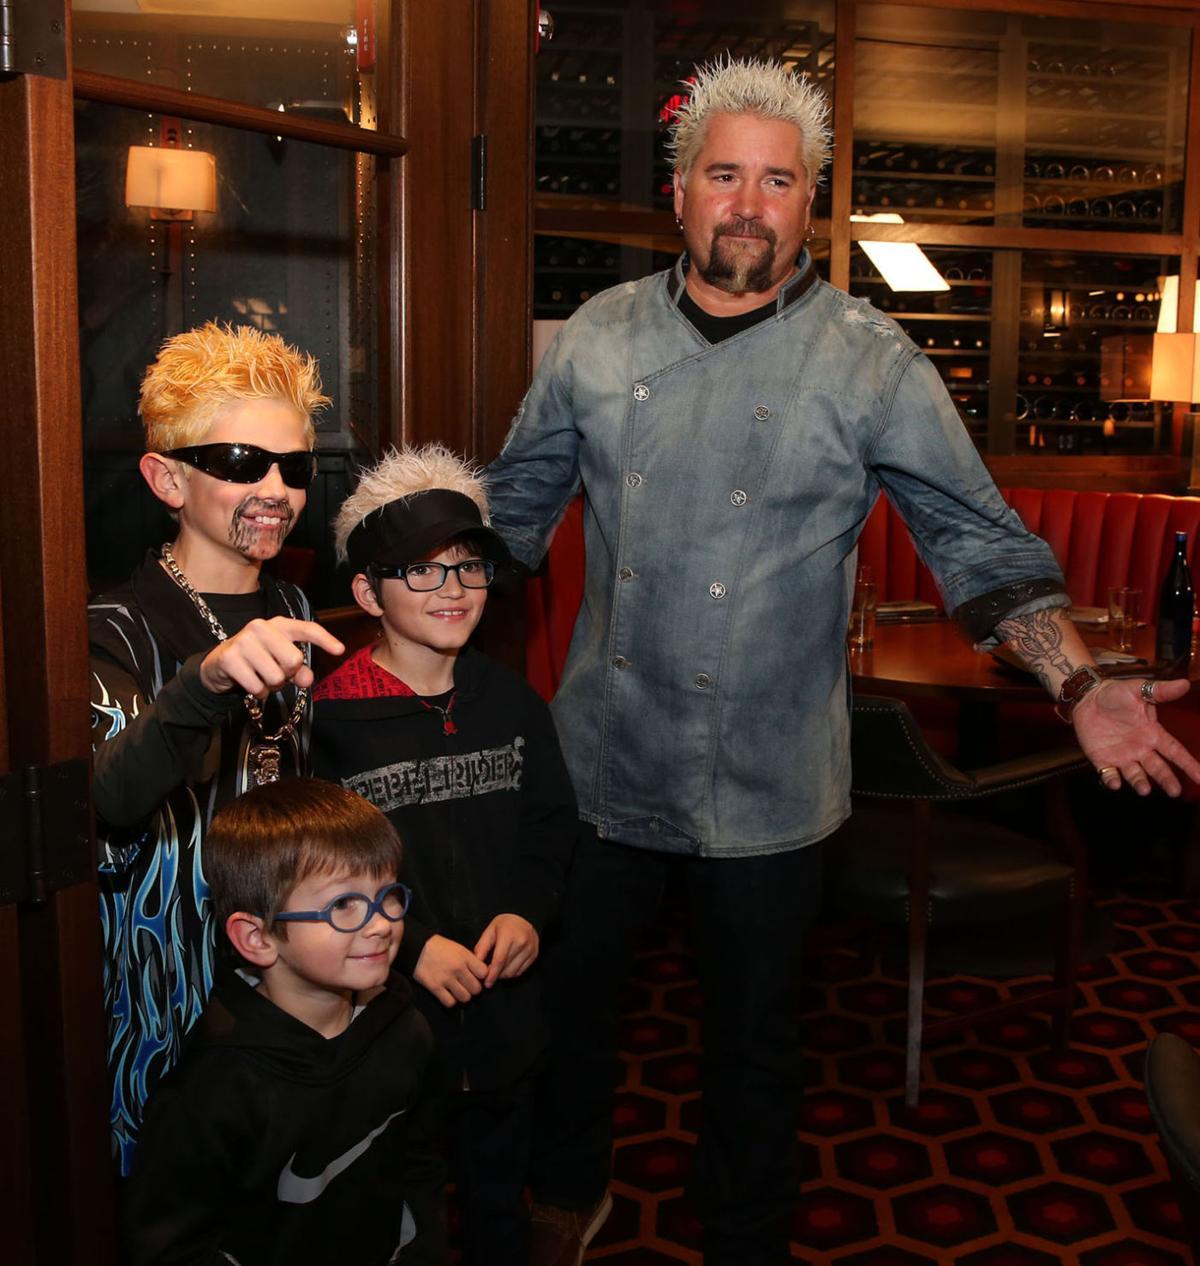 Guy Fieri visited his new restaurant called Guy's Chophouse, Bally's Atlantic City